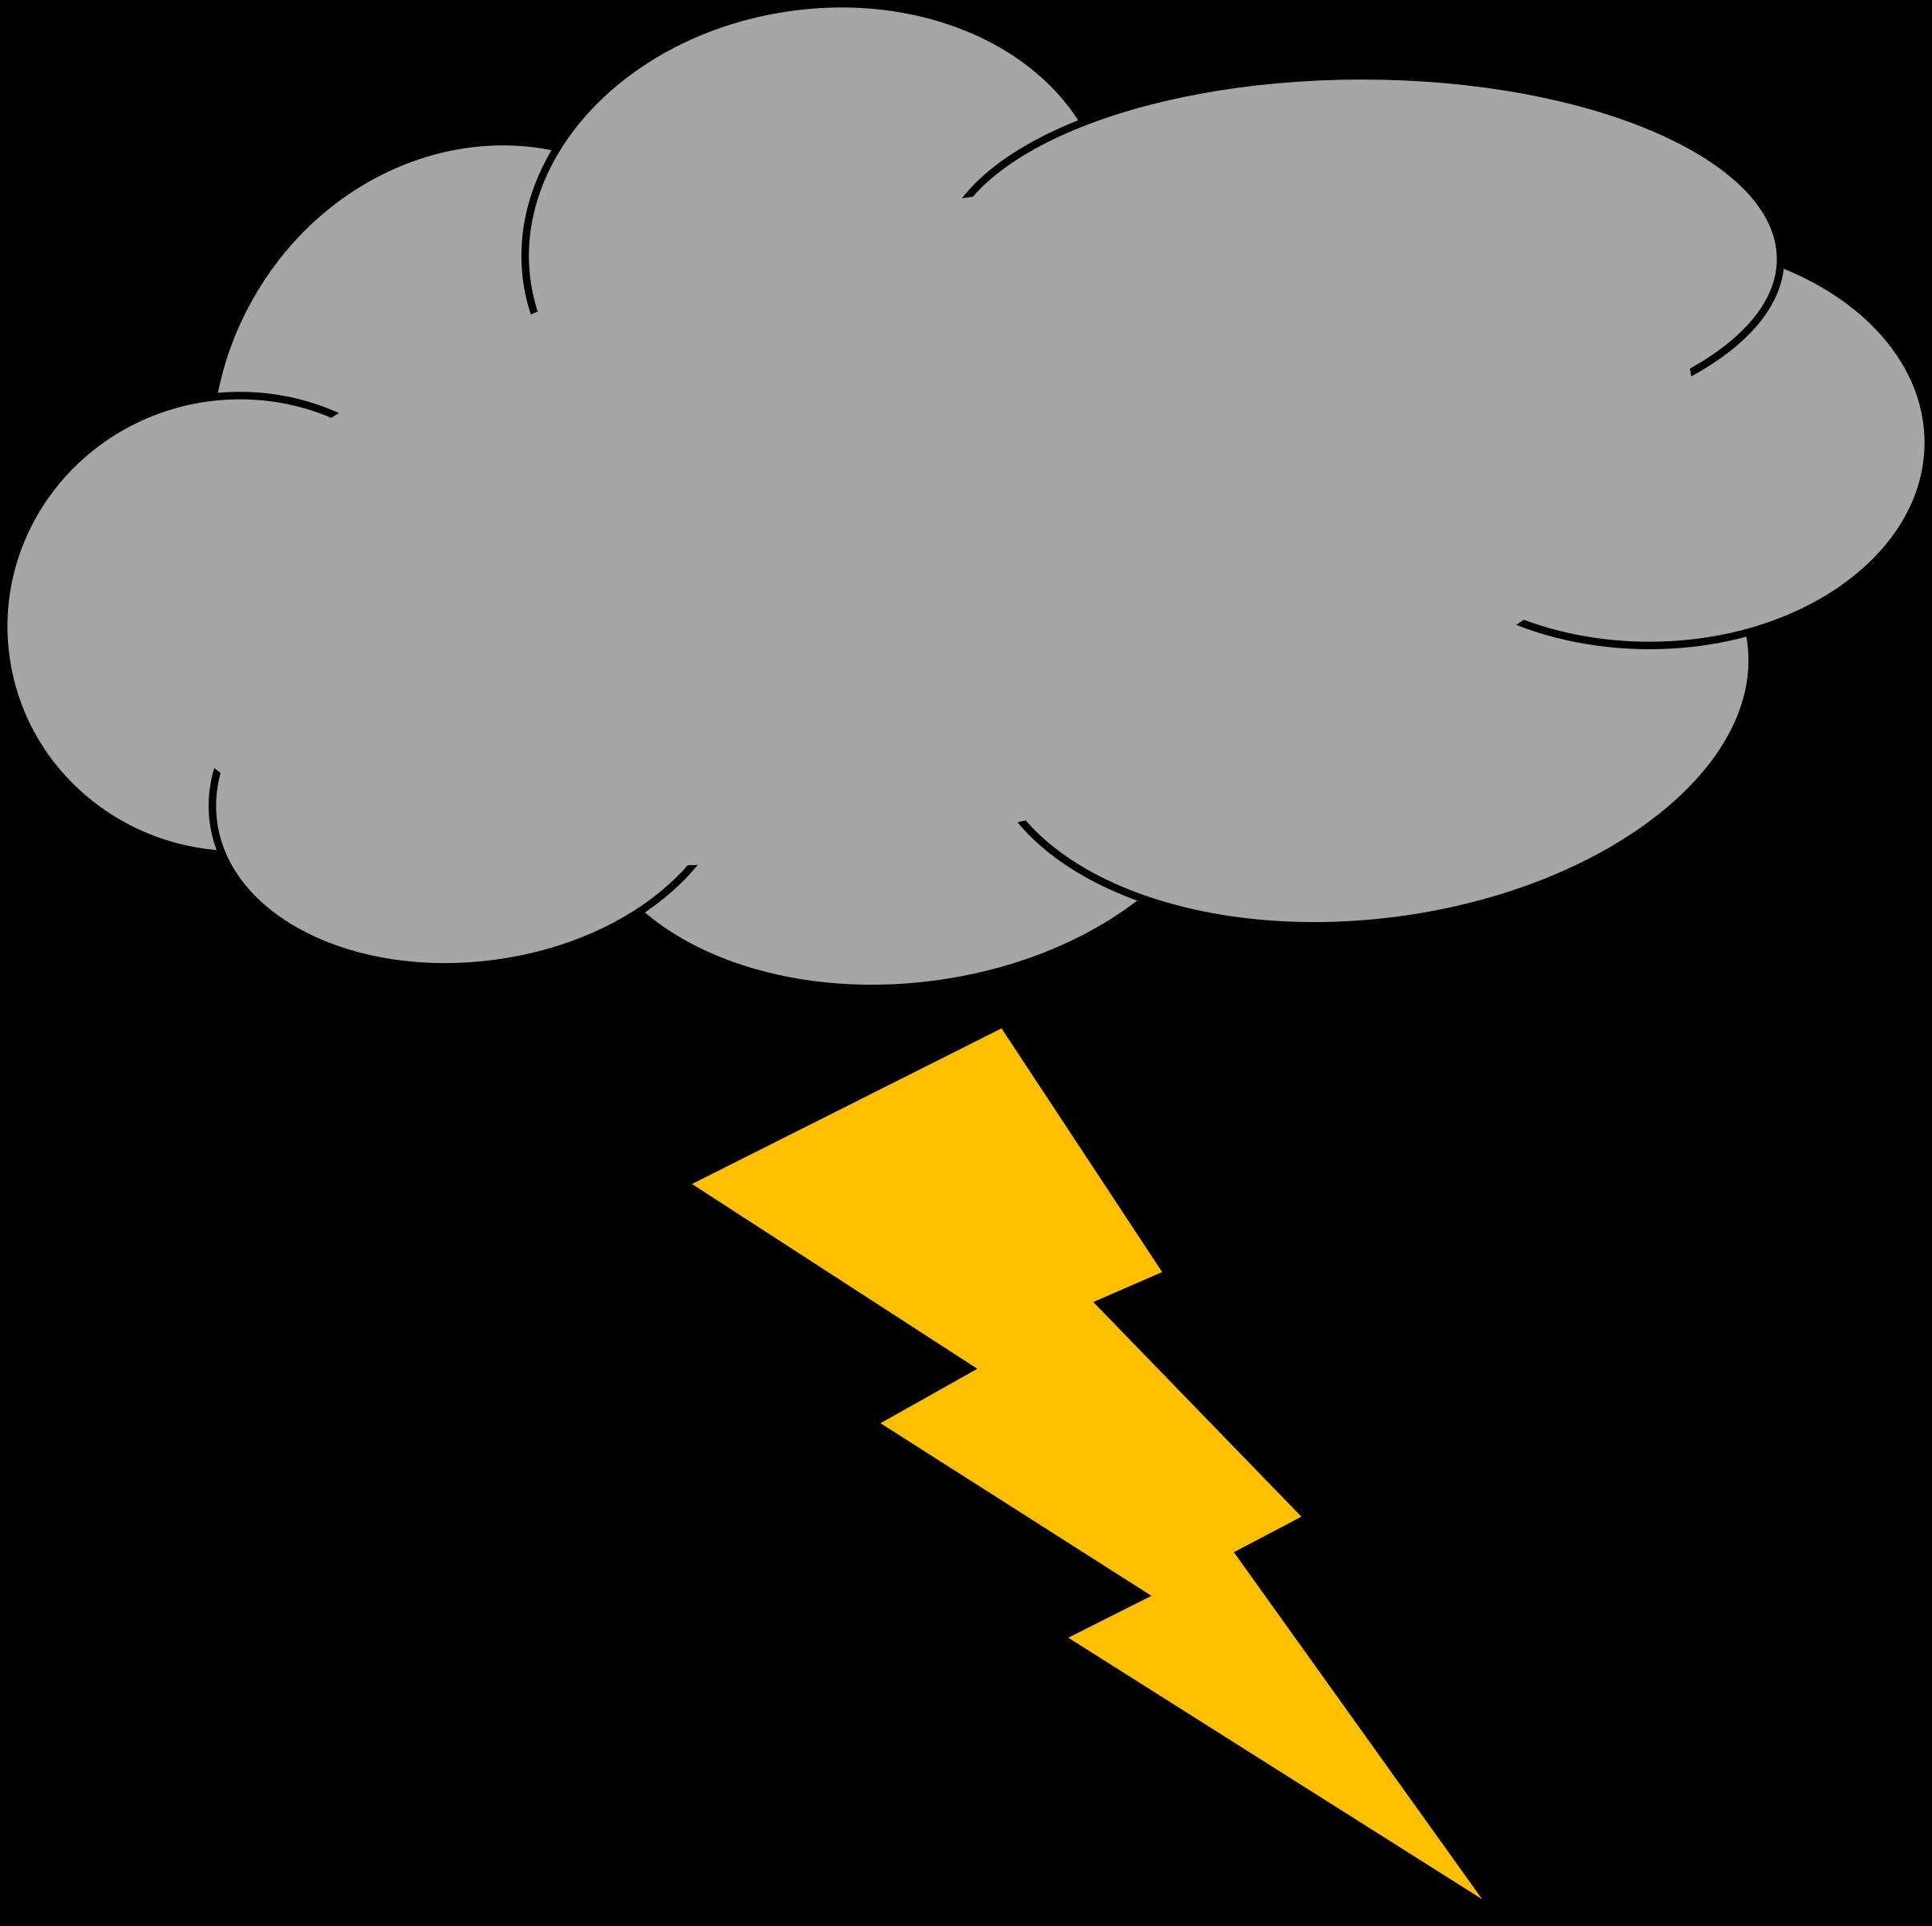 Lightning clipart thundercloud. Thunder and big image